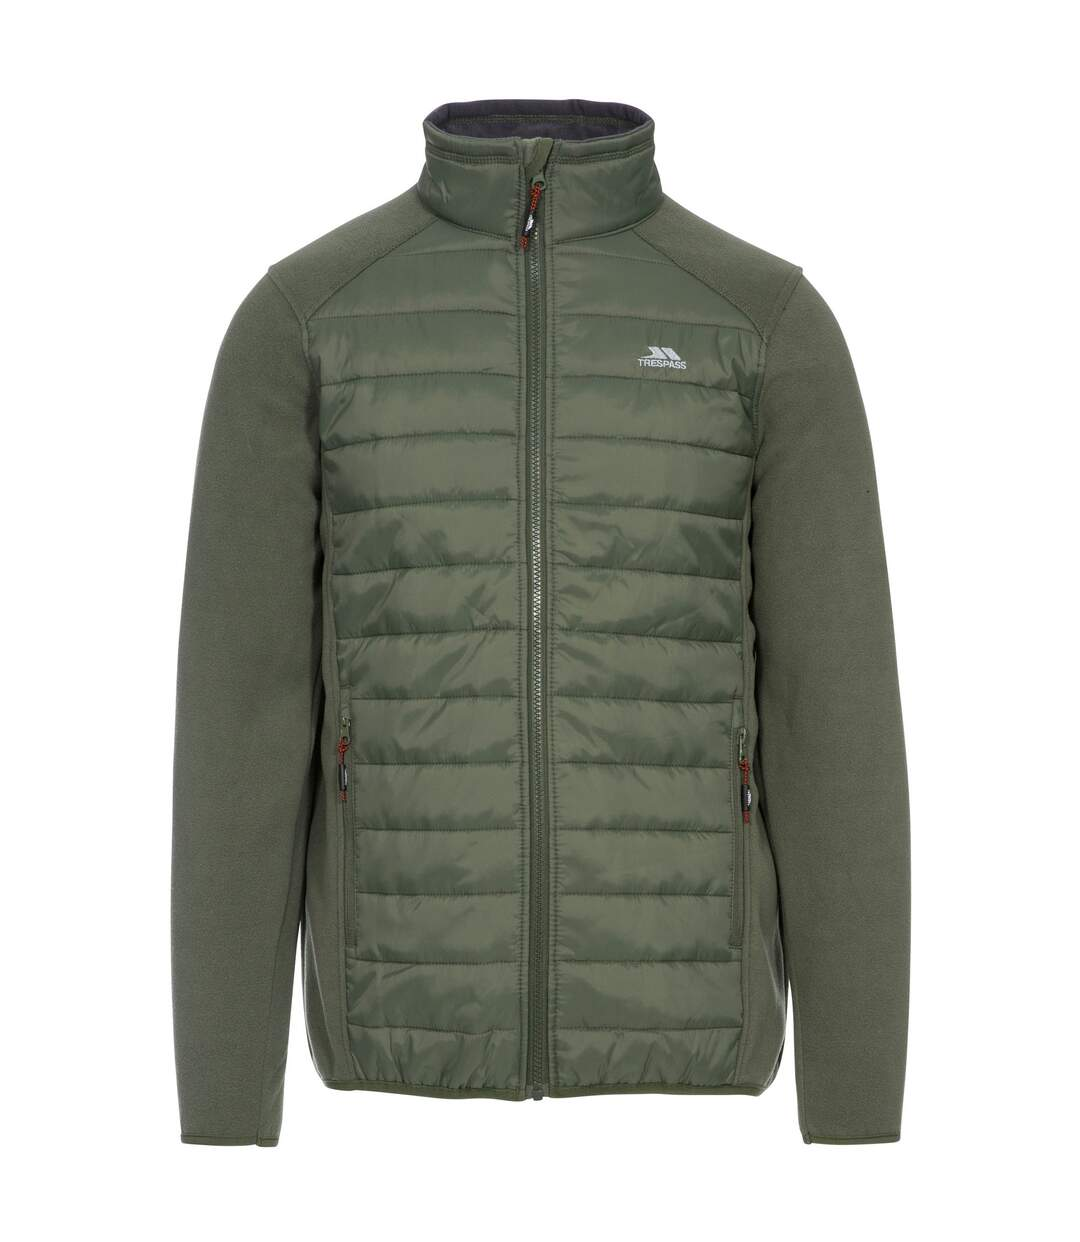 Trespass Mens Saunter Full Zip Fleece Jacket (Basil) - UTTP3564